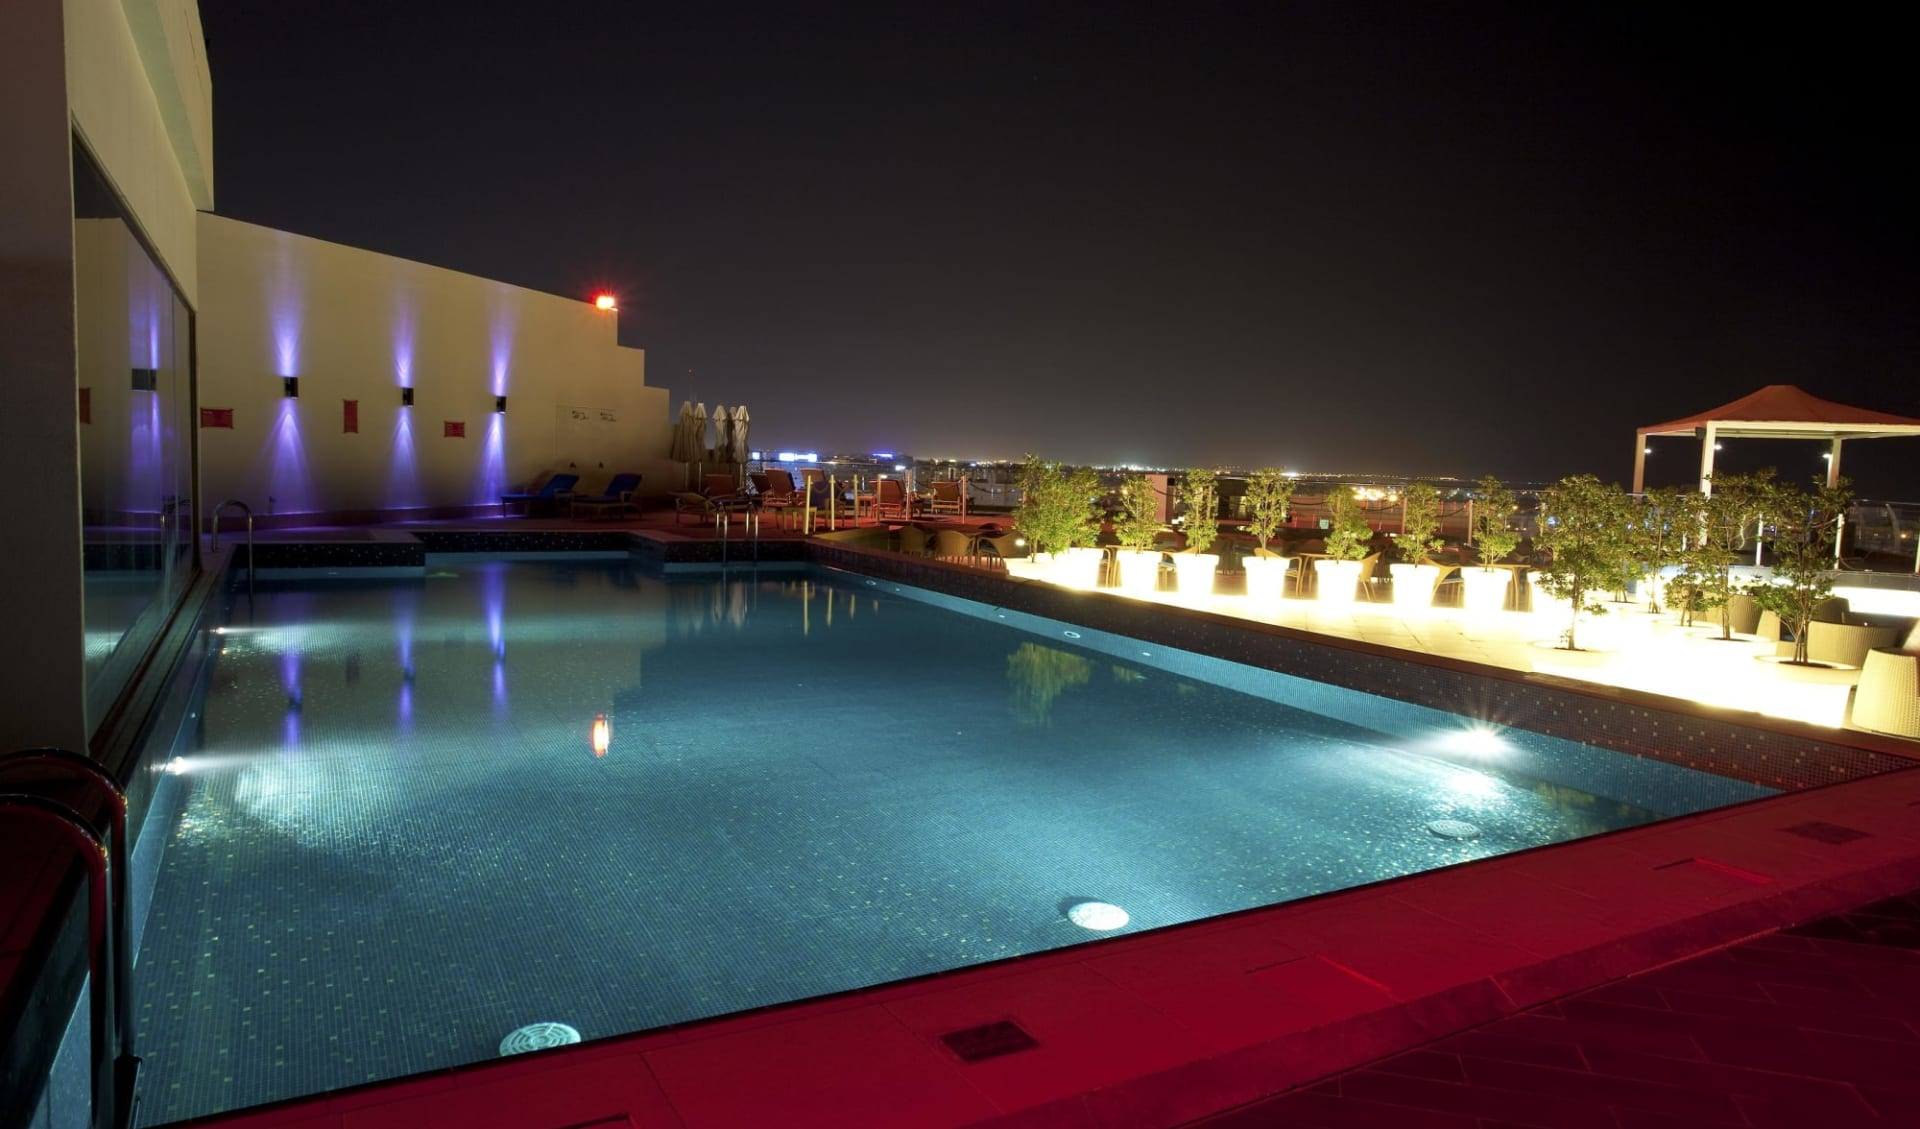 Radisson BLU in Muscat: